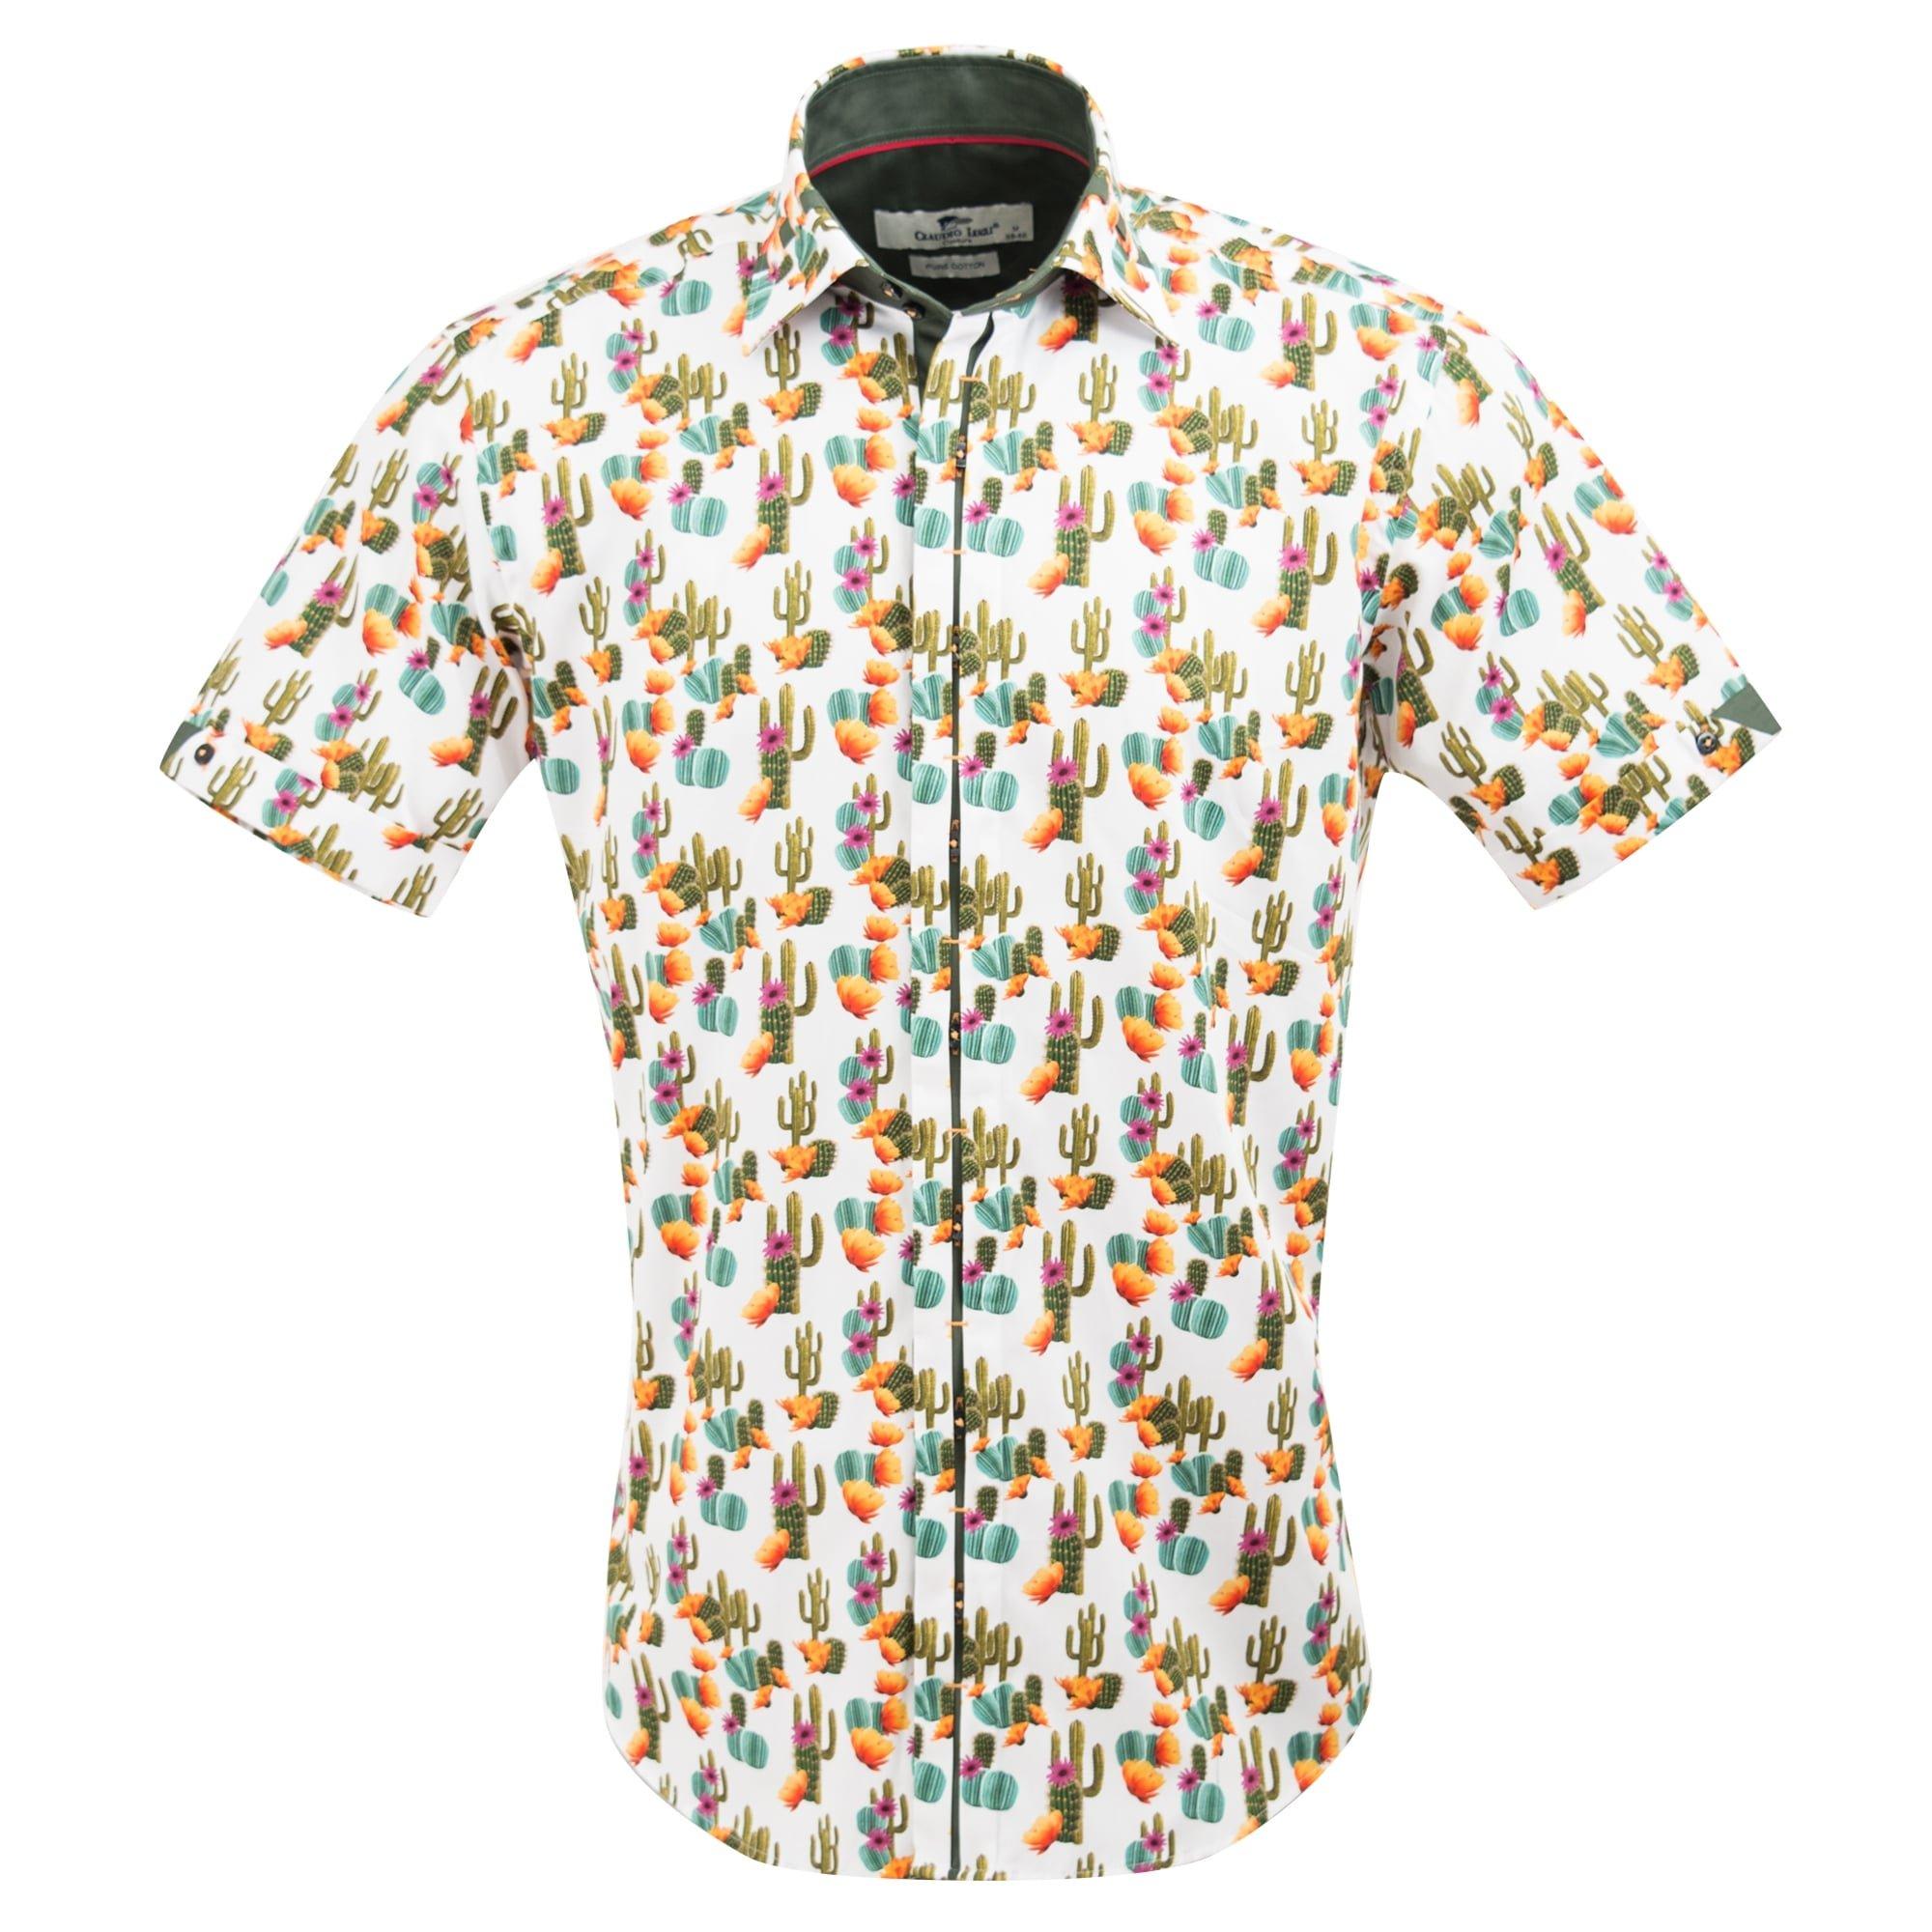 Claudio Lugli Men's Cactus Print Fashion Luxury Cotton Short Sleeve Summer Casual Shirt CP6407 2xlarge Multi